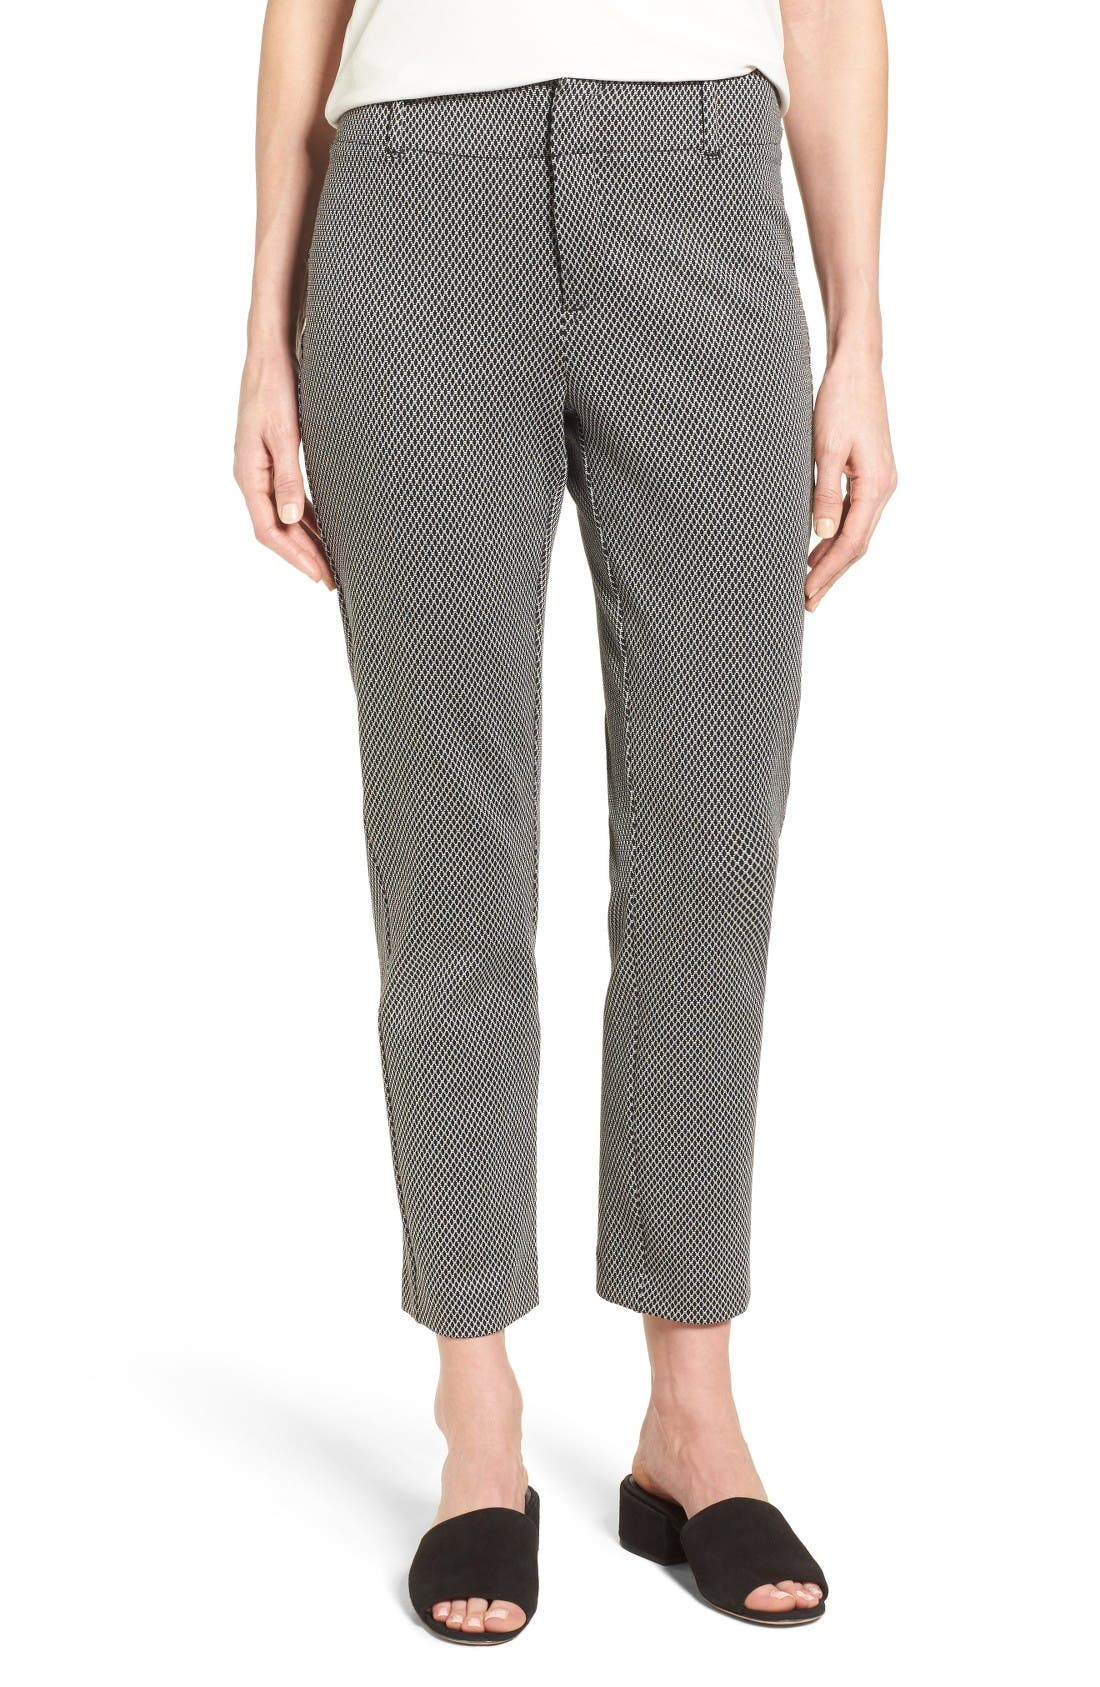 Alternate Image 1 Selected - NYDJ Renee Stretch Jacquard Ankle Pants